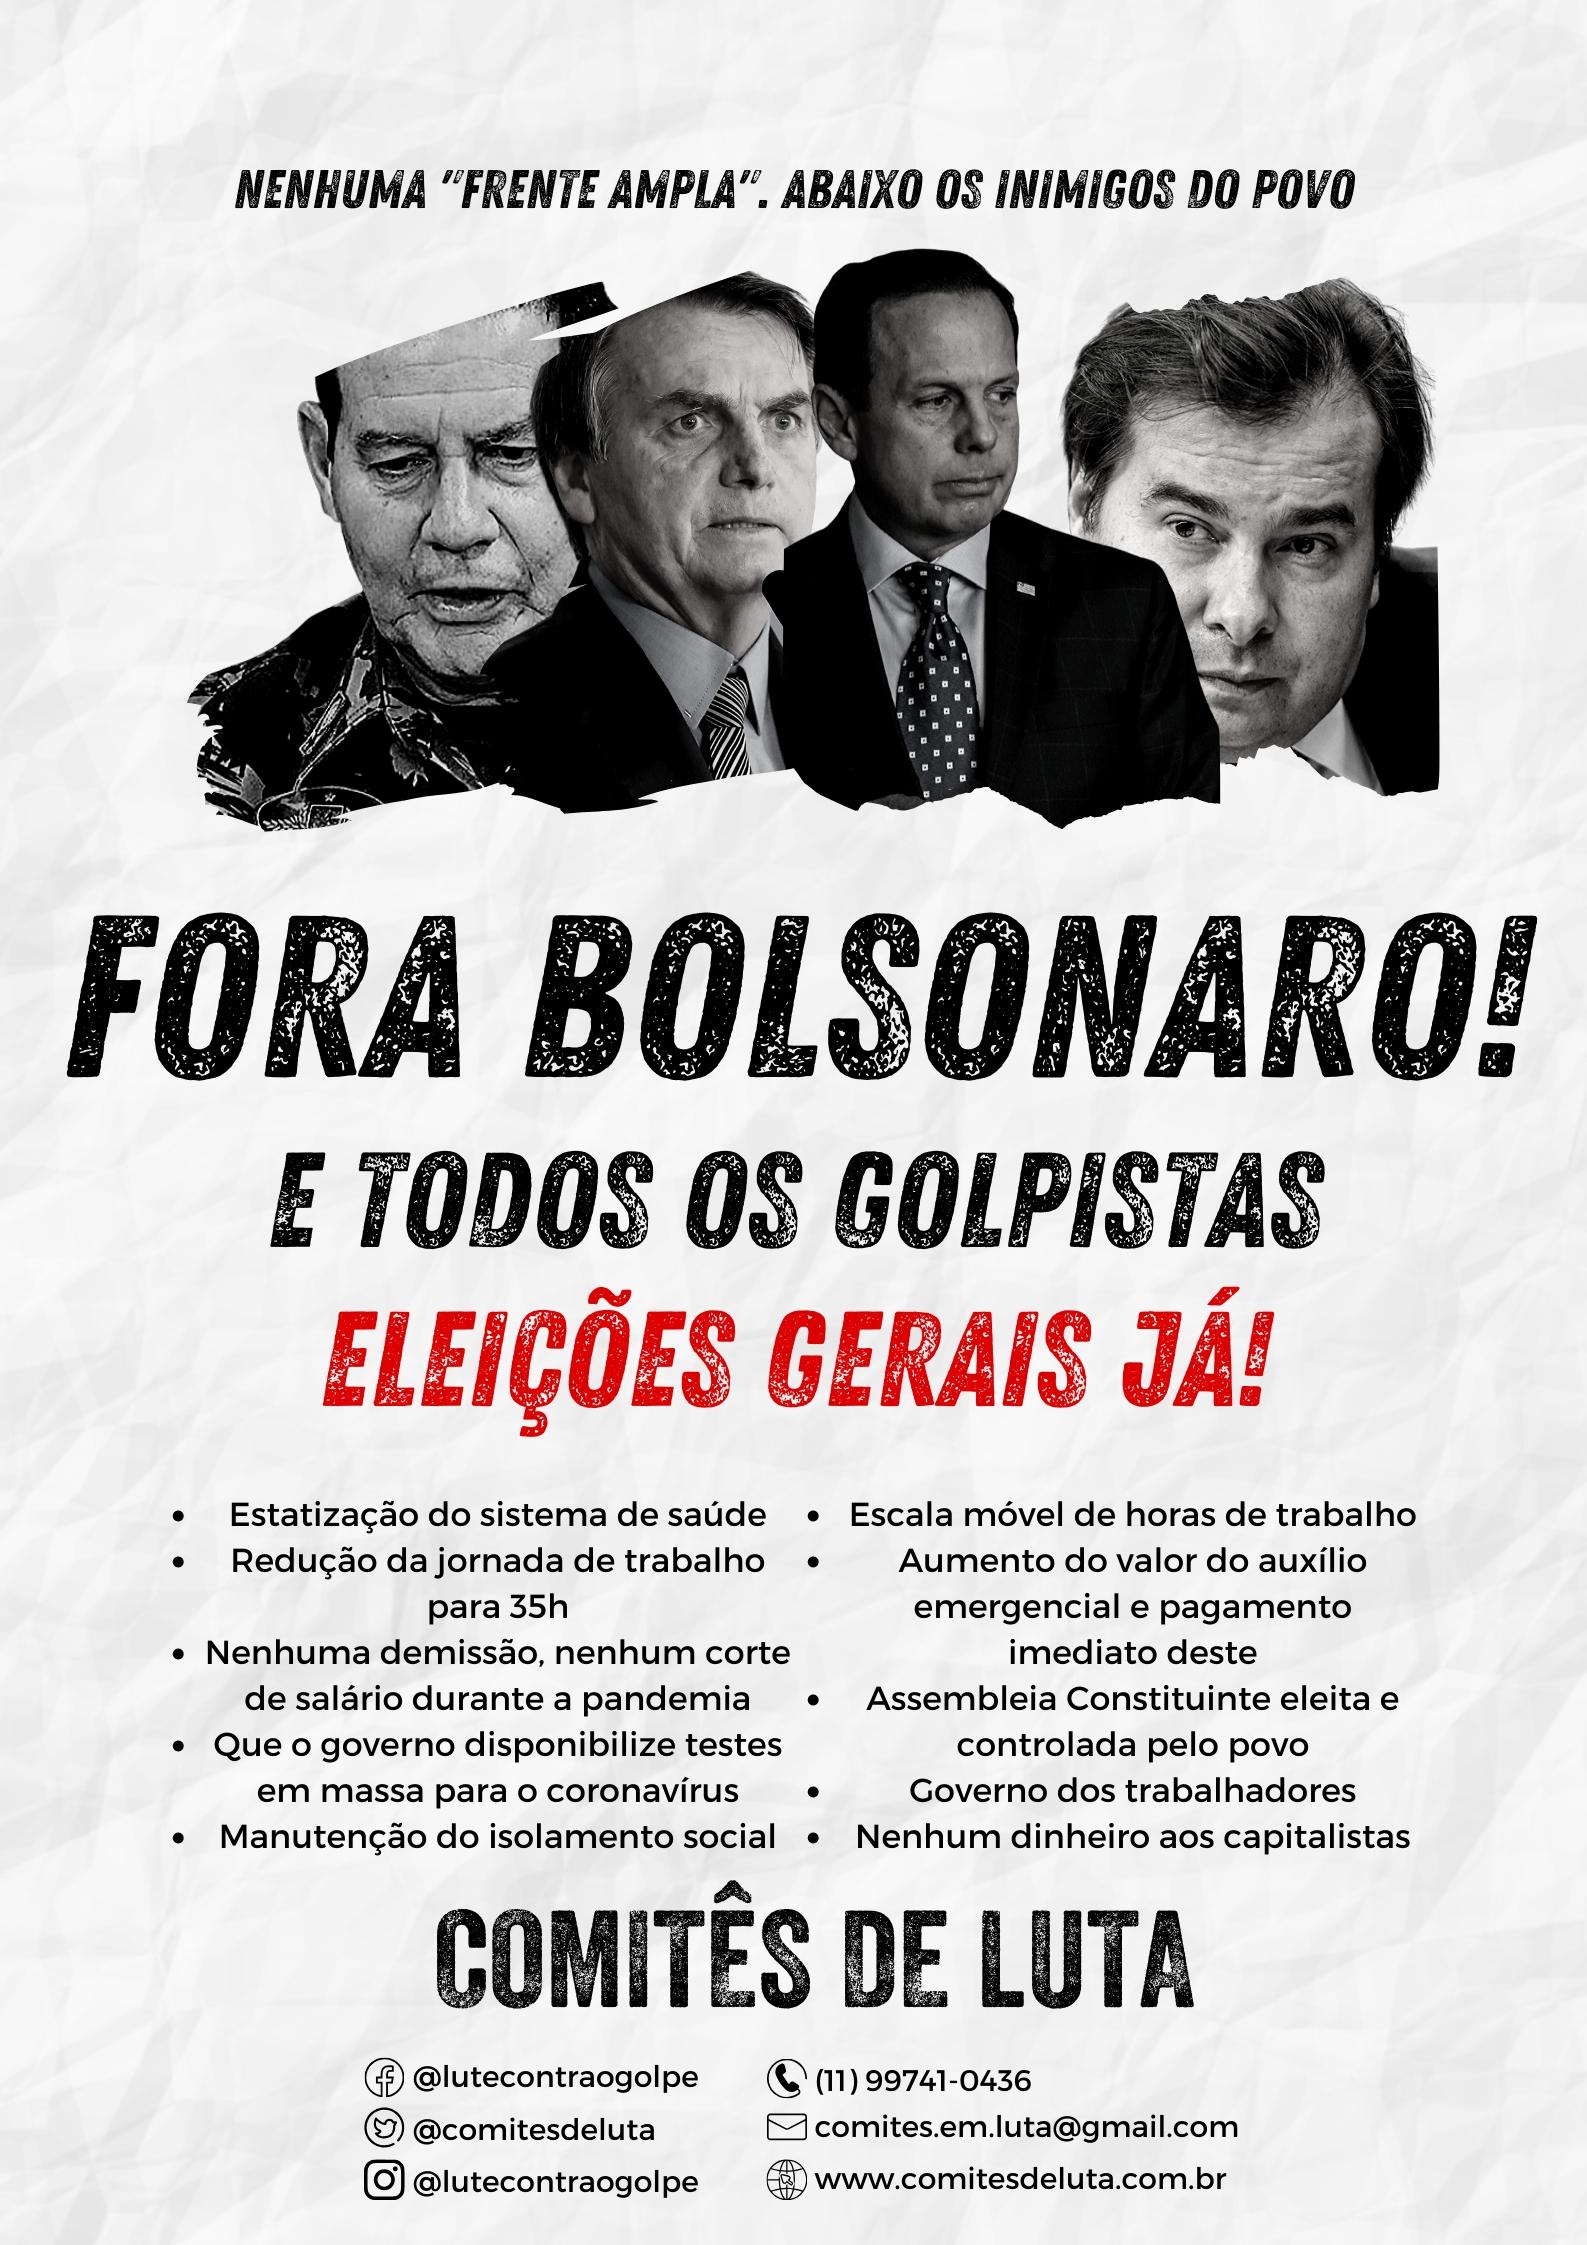 FORA BOLSONARO!